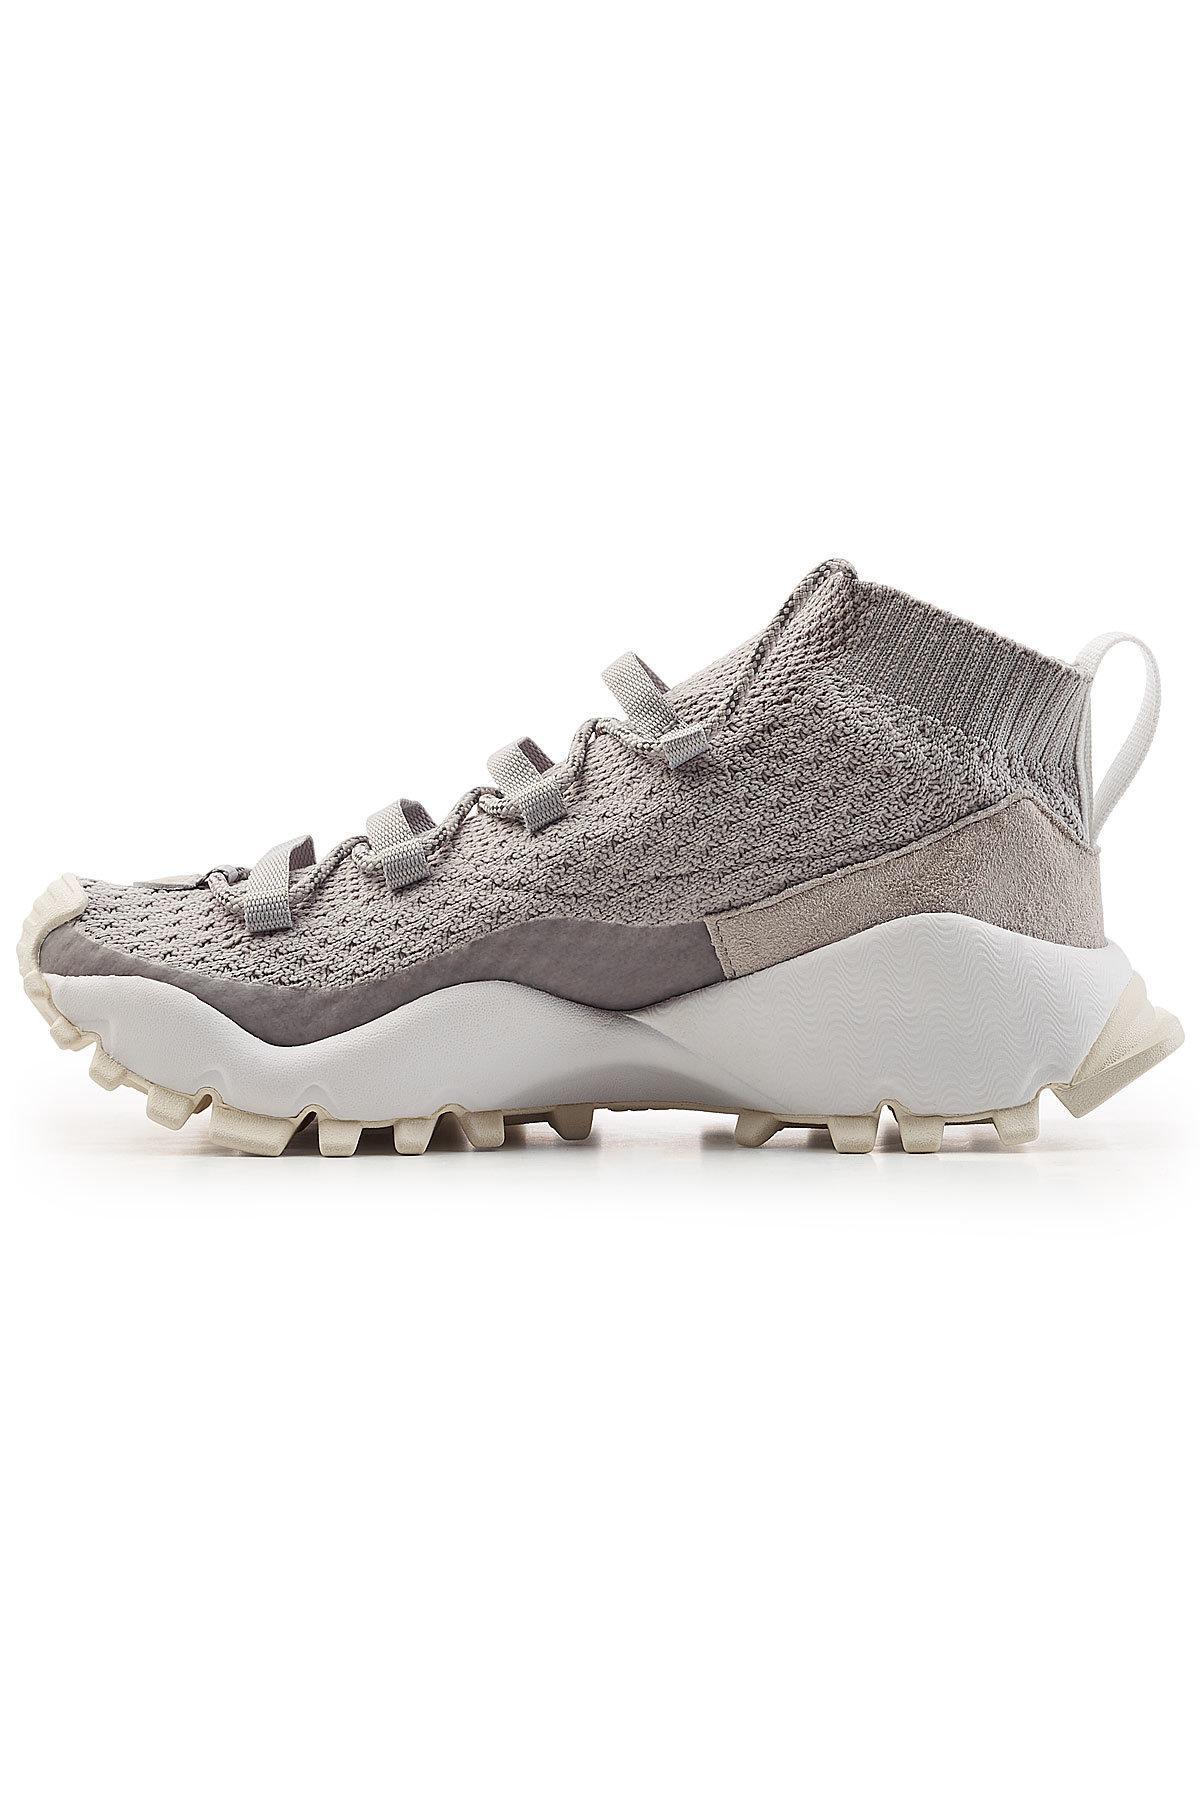 262d145c45f3 Lyst - adidas Originals Seeulater Primeknit Winter Sneakers in Gray ...